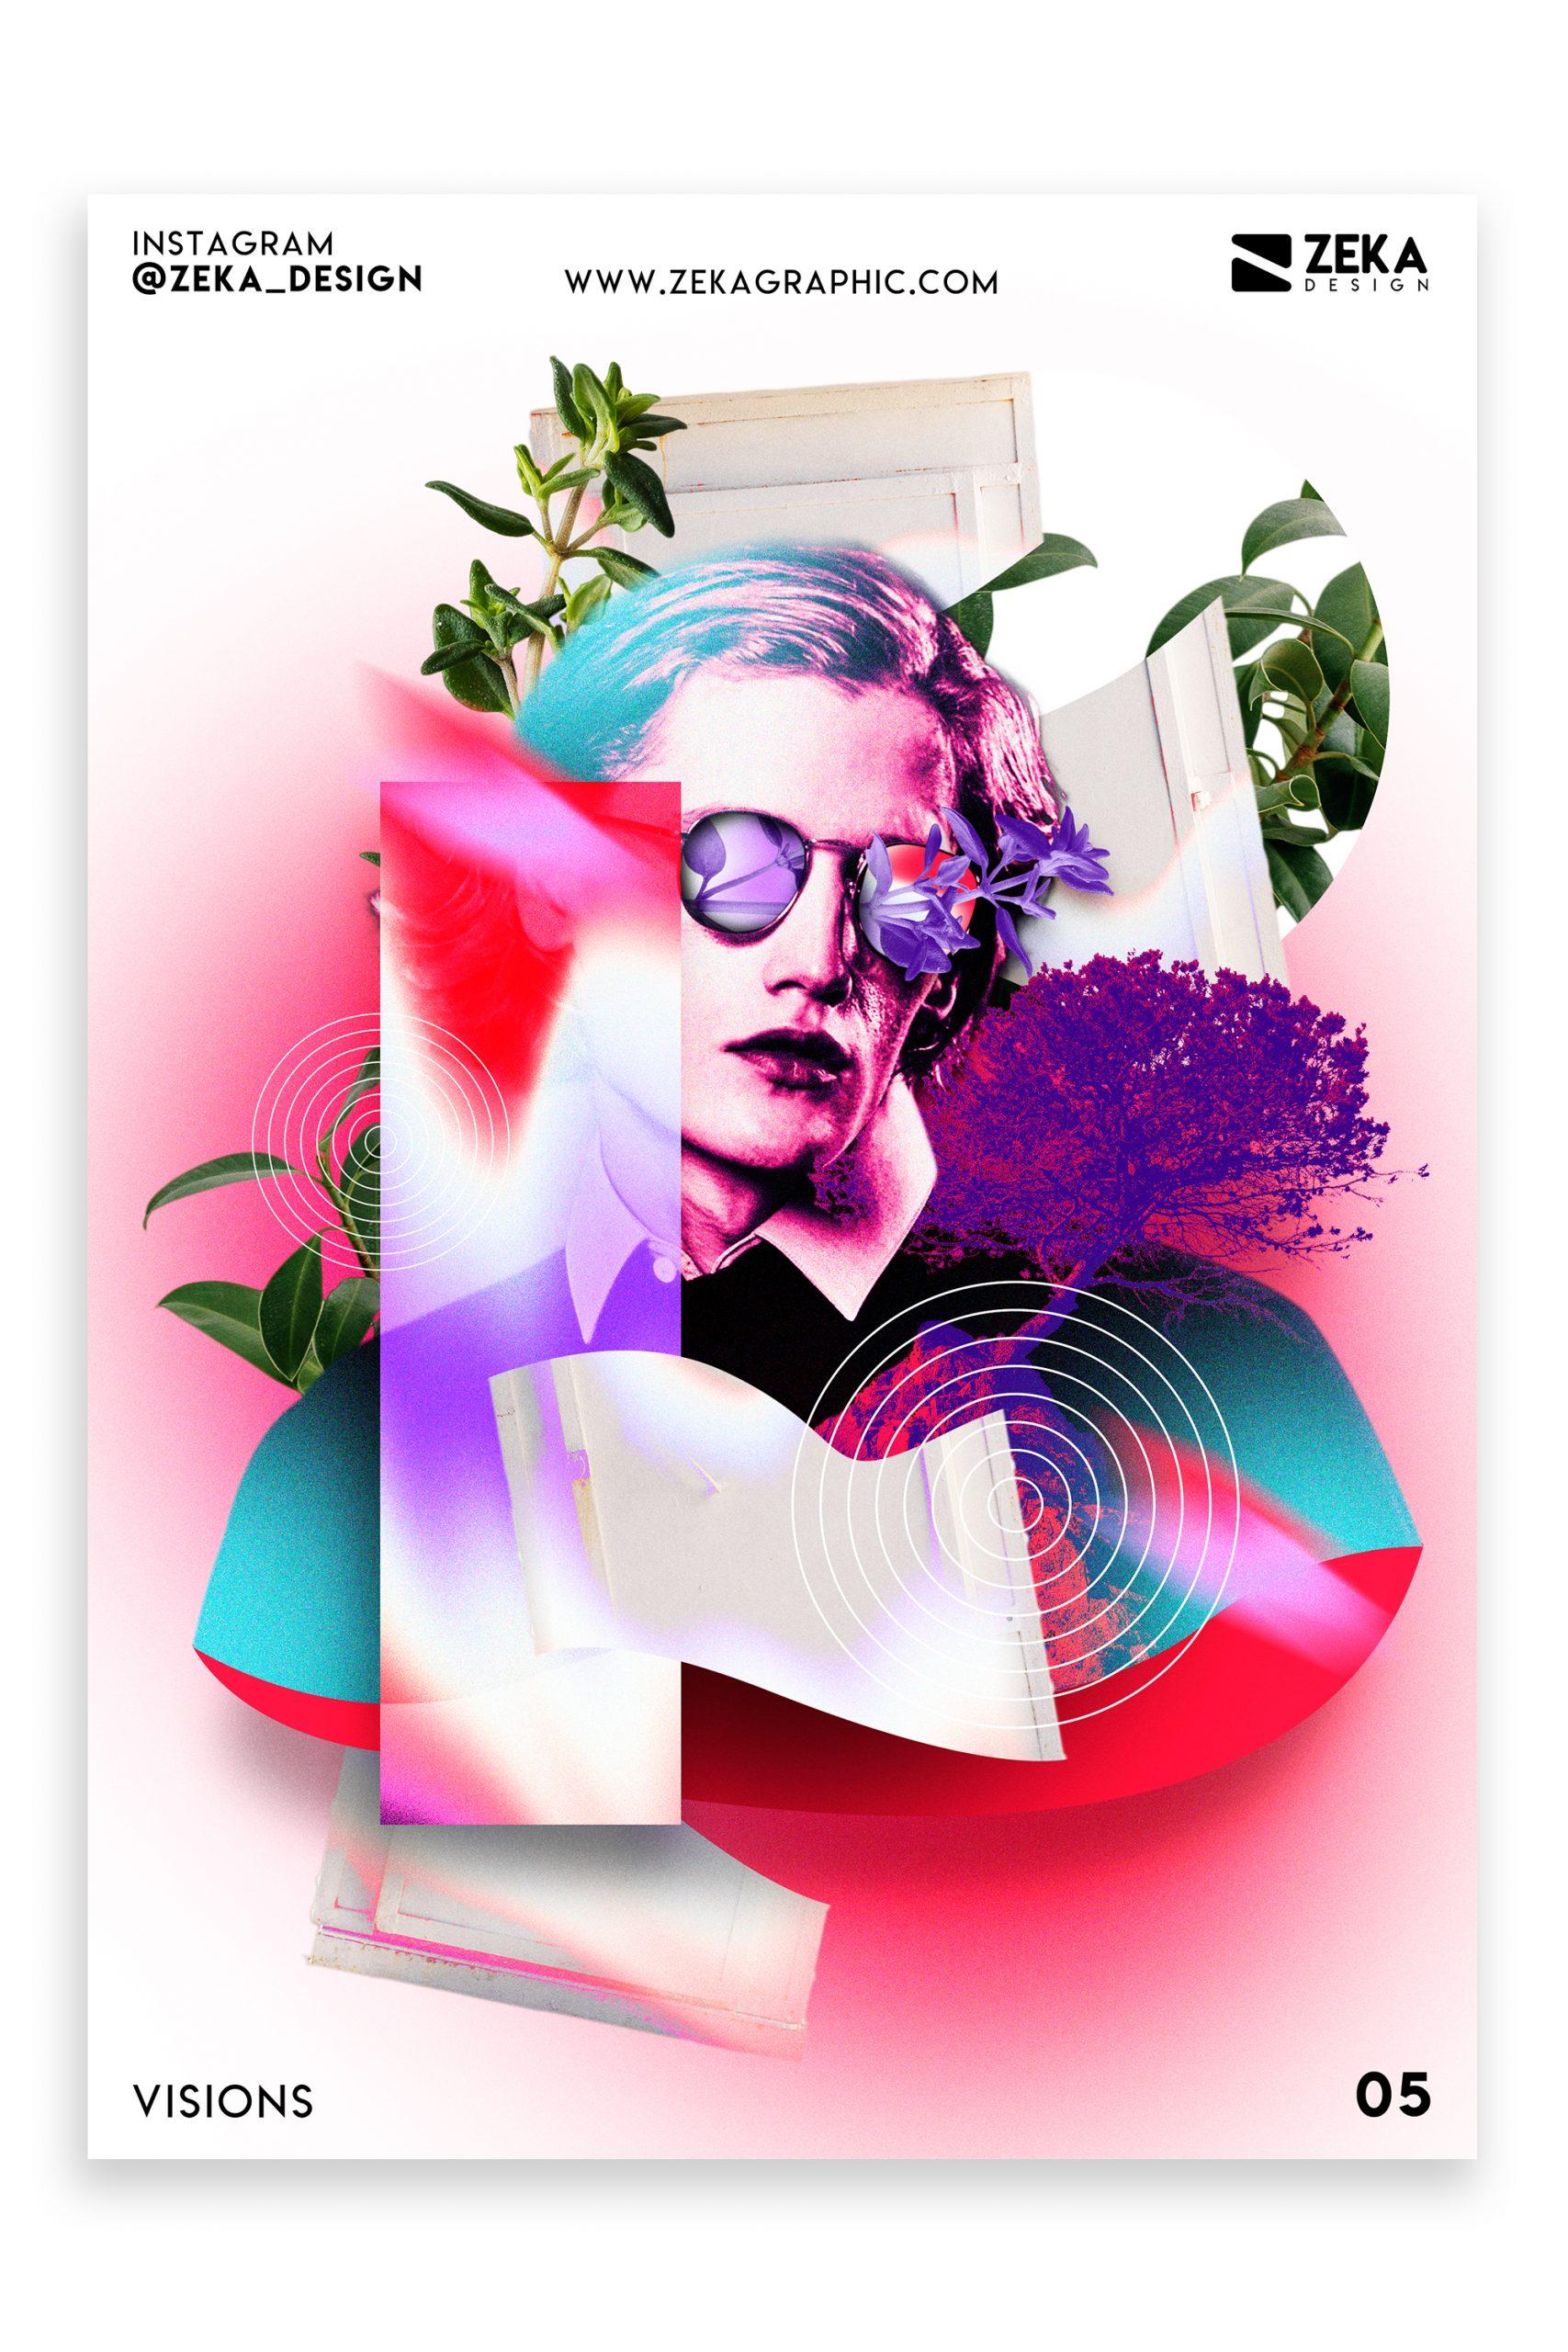 Visions Poster Design Inspiration Zeka Design Graphic Design Portfolio 5